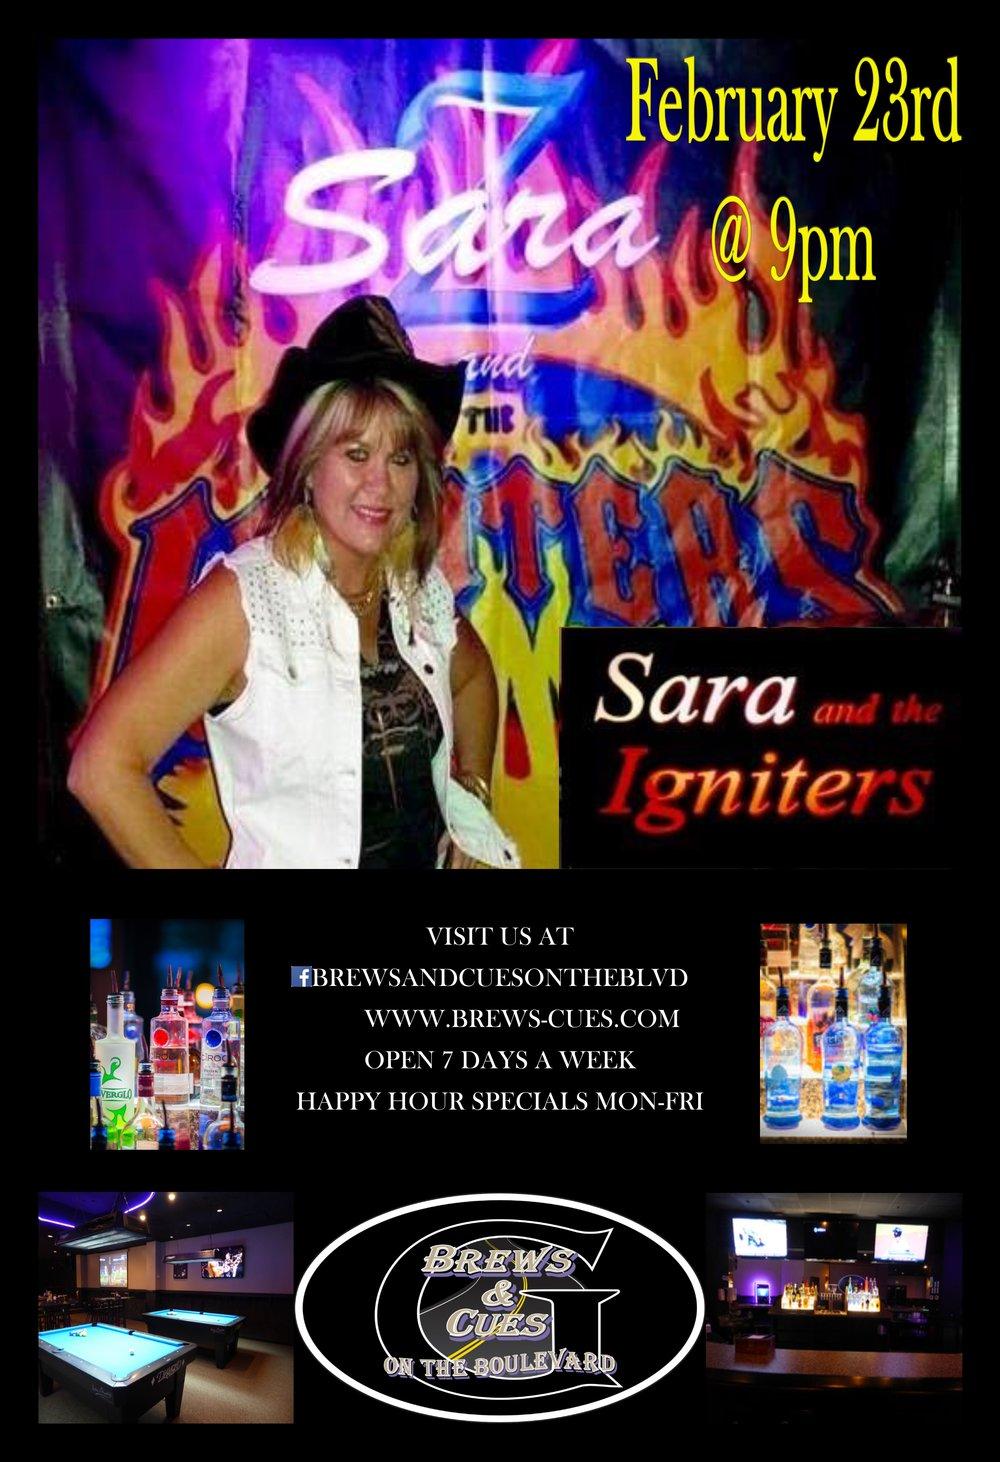 2-23 Sara & Igniters.jpg